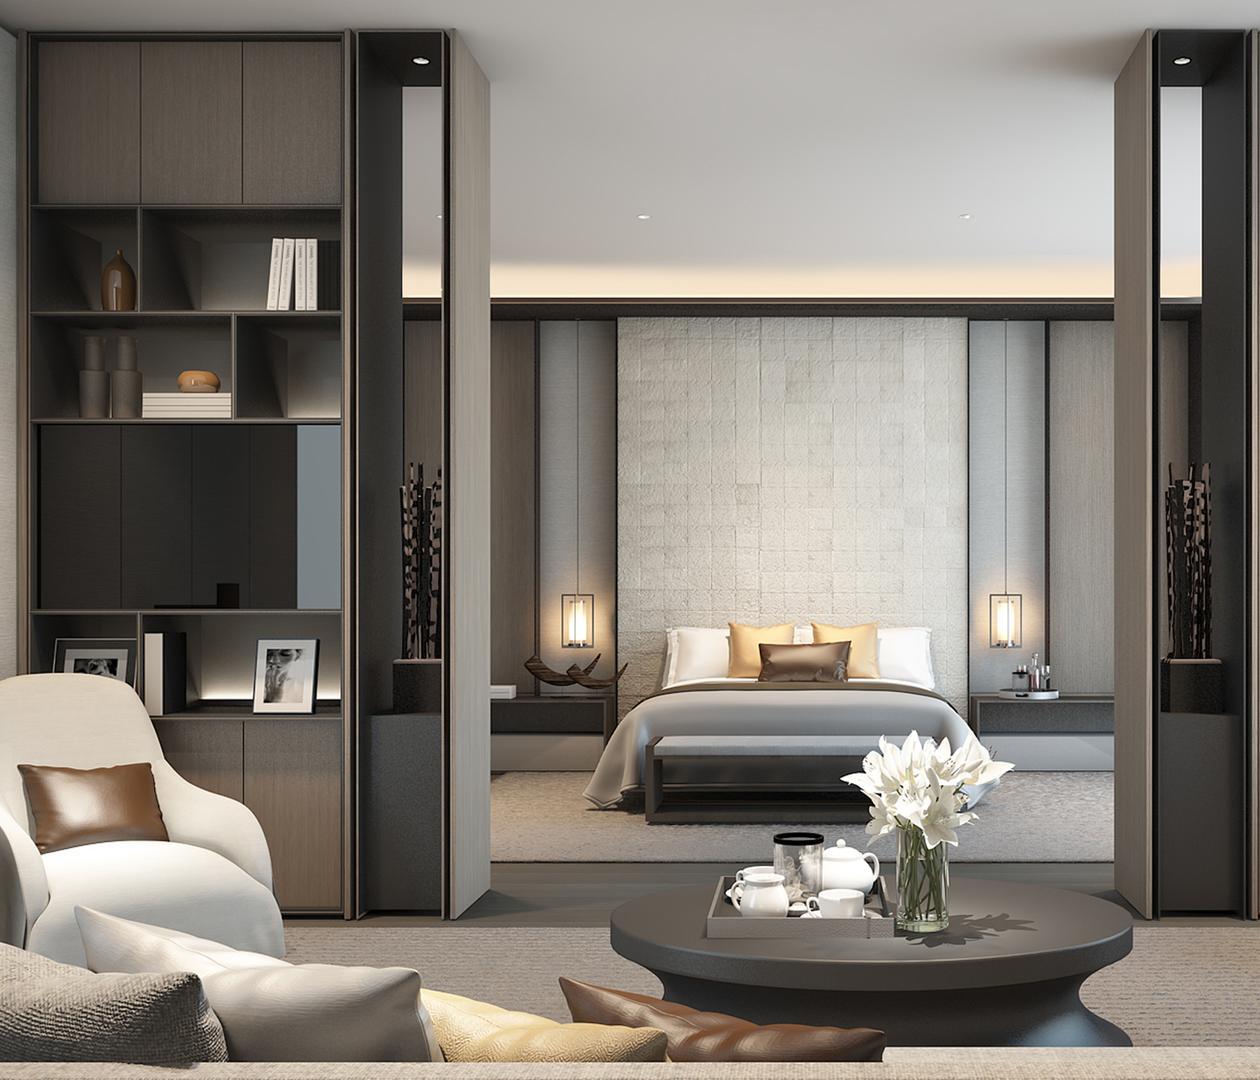 Bedroom Cupboards Brisbane Modern Romantic Bedroom Interior Purple Black And White Bedroom Korean Drama Bedroom Design: Pvp艾迪lp技能-天策pvp技能循环,eve增加lp点的技能,藏剑pvp技能,剑三pvp技能监控插件,剑三霸刀